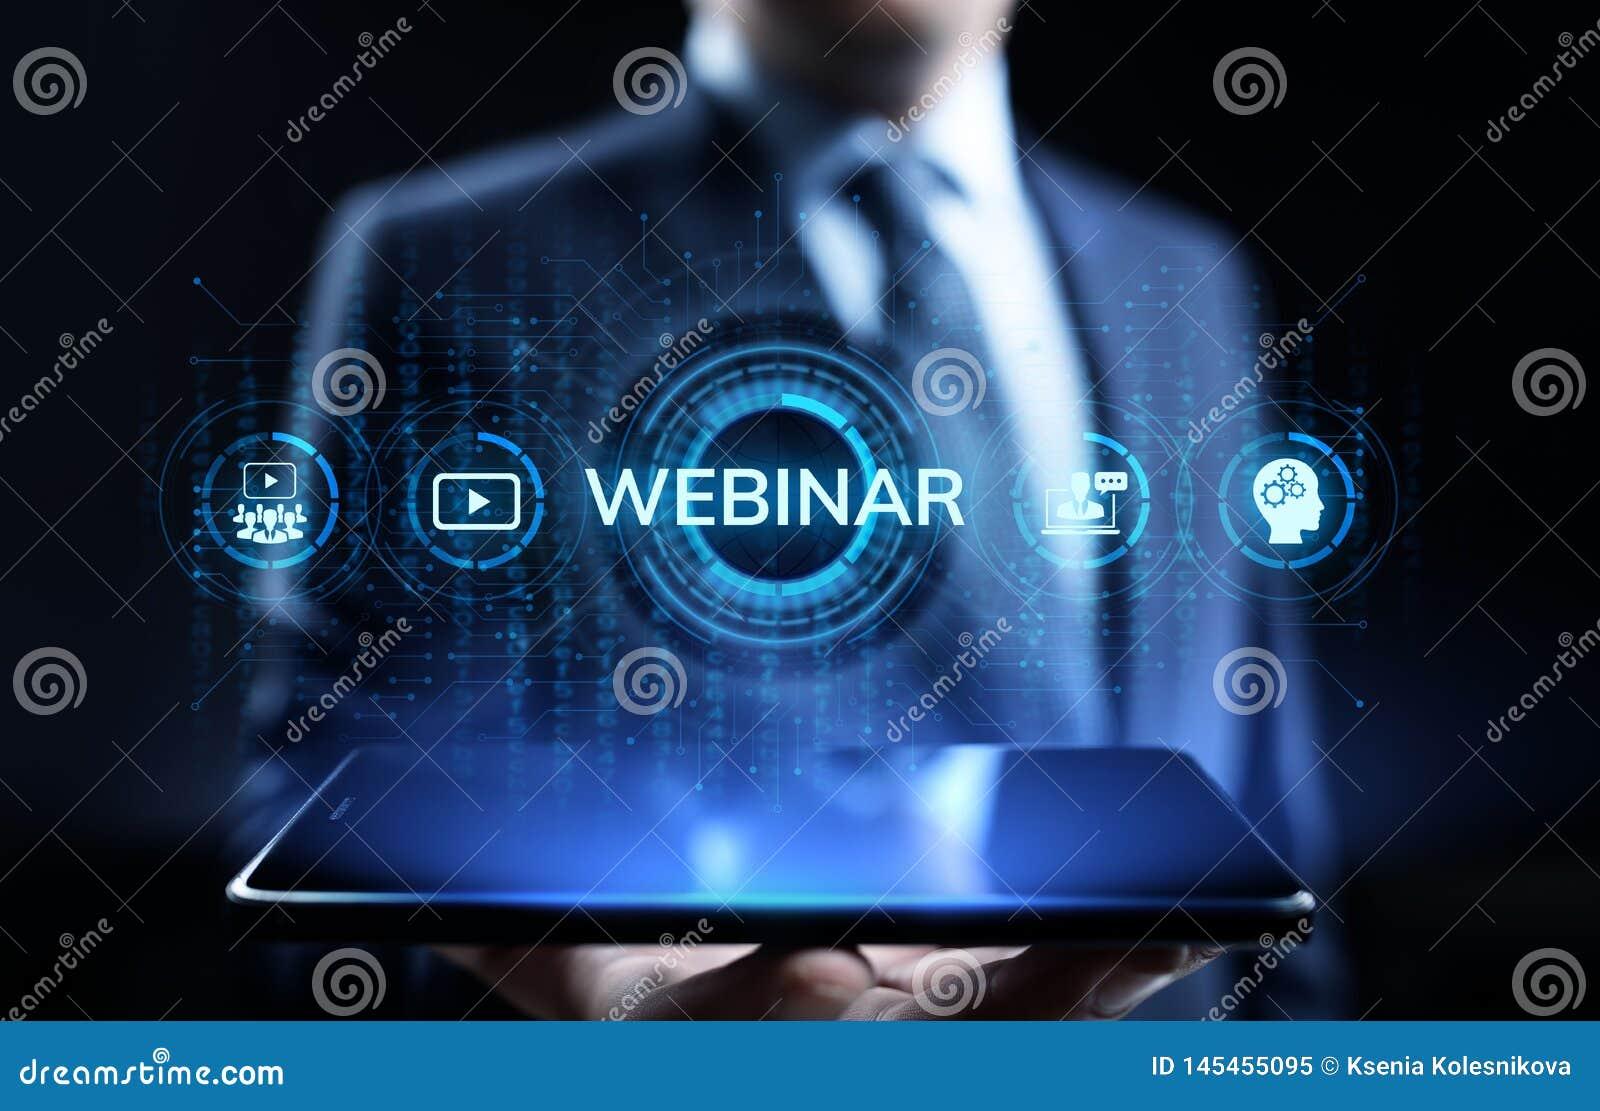 Webinar电子教学网上研讨会教育产业概念